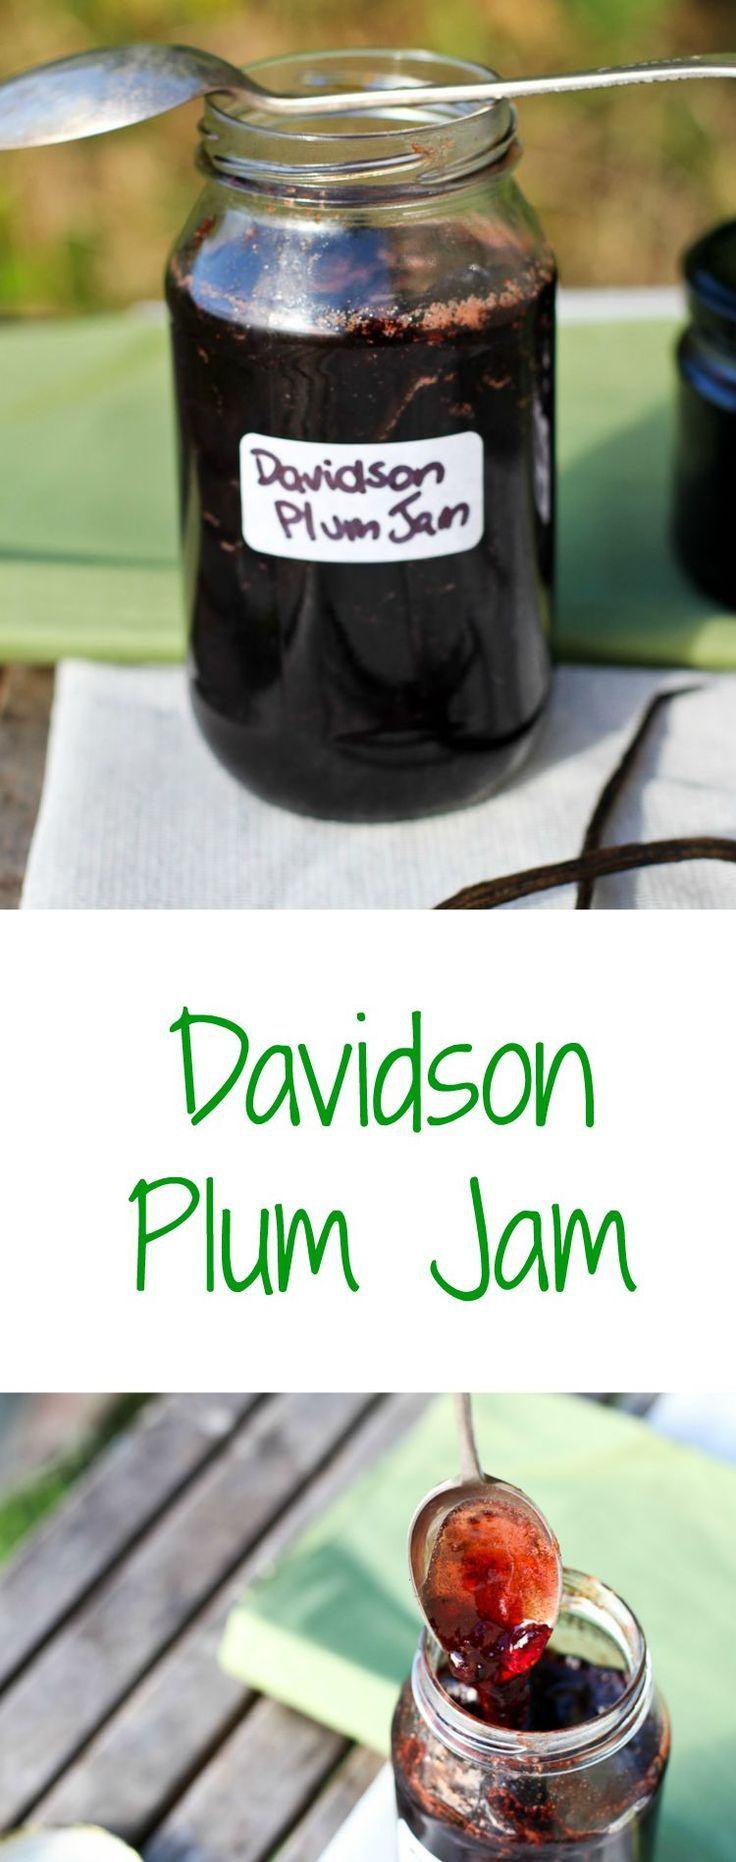 100% Australian Davidson Plum Jam Recipe